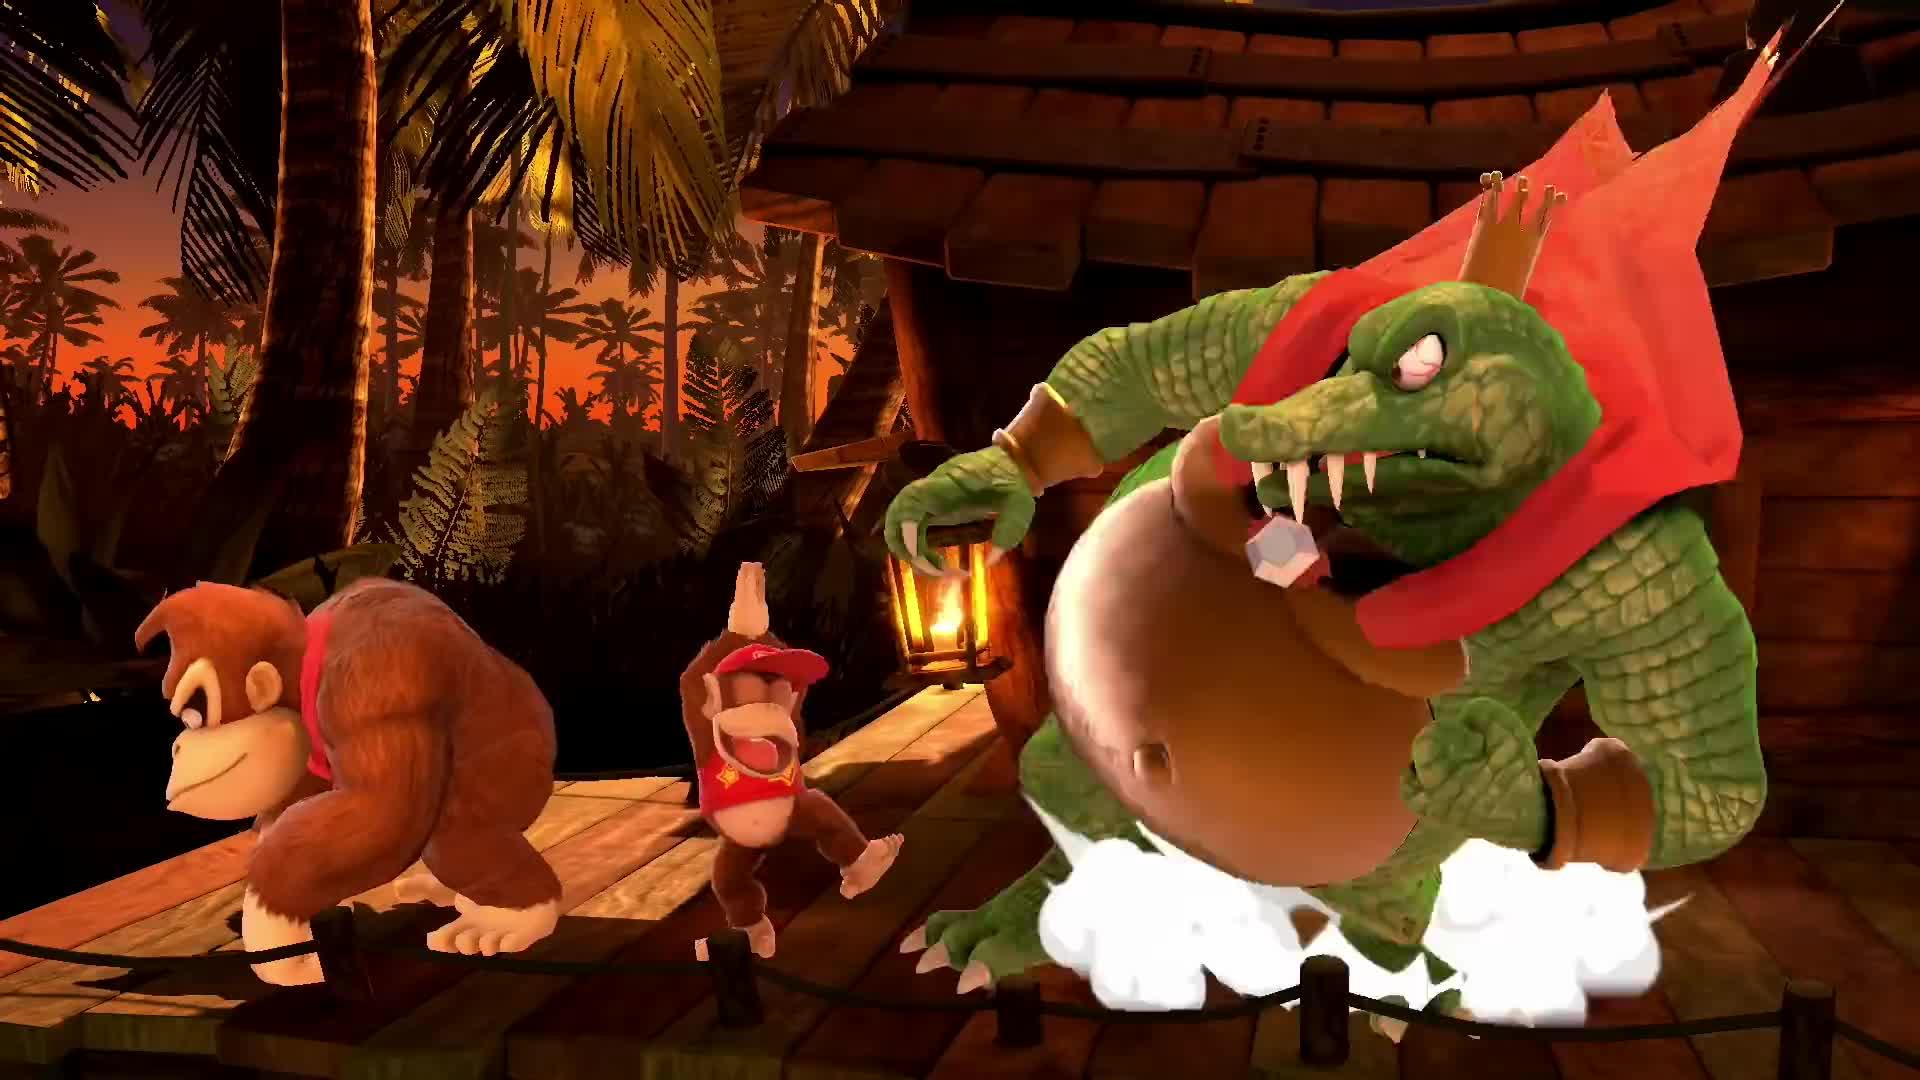 Nintendo, Nintendo Switch, Switch, Super Smash Bros. Ultimate, Super Smash Bros., Smash Bros.